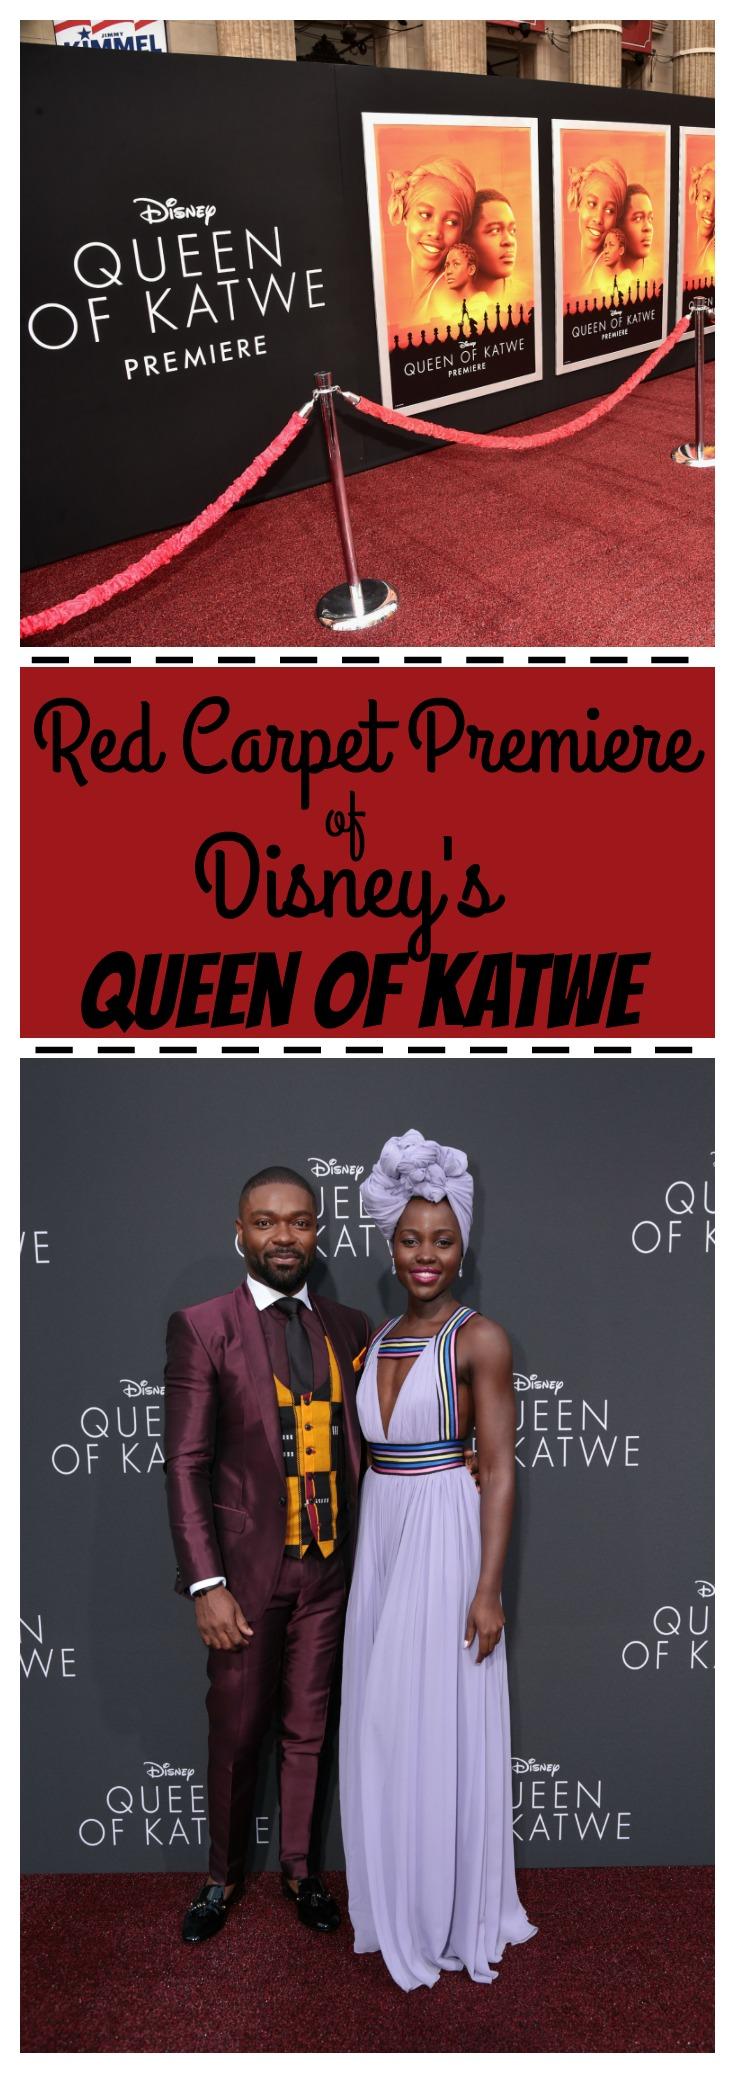 Disney's Queen of Katwe Red Carpet Premiere